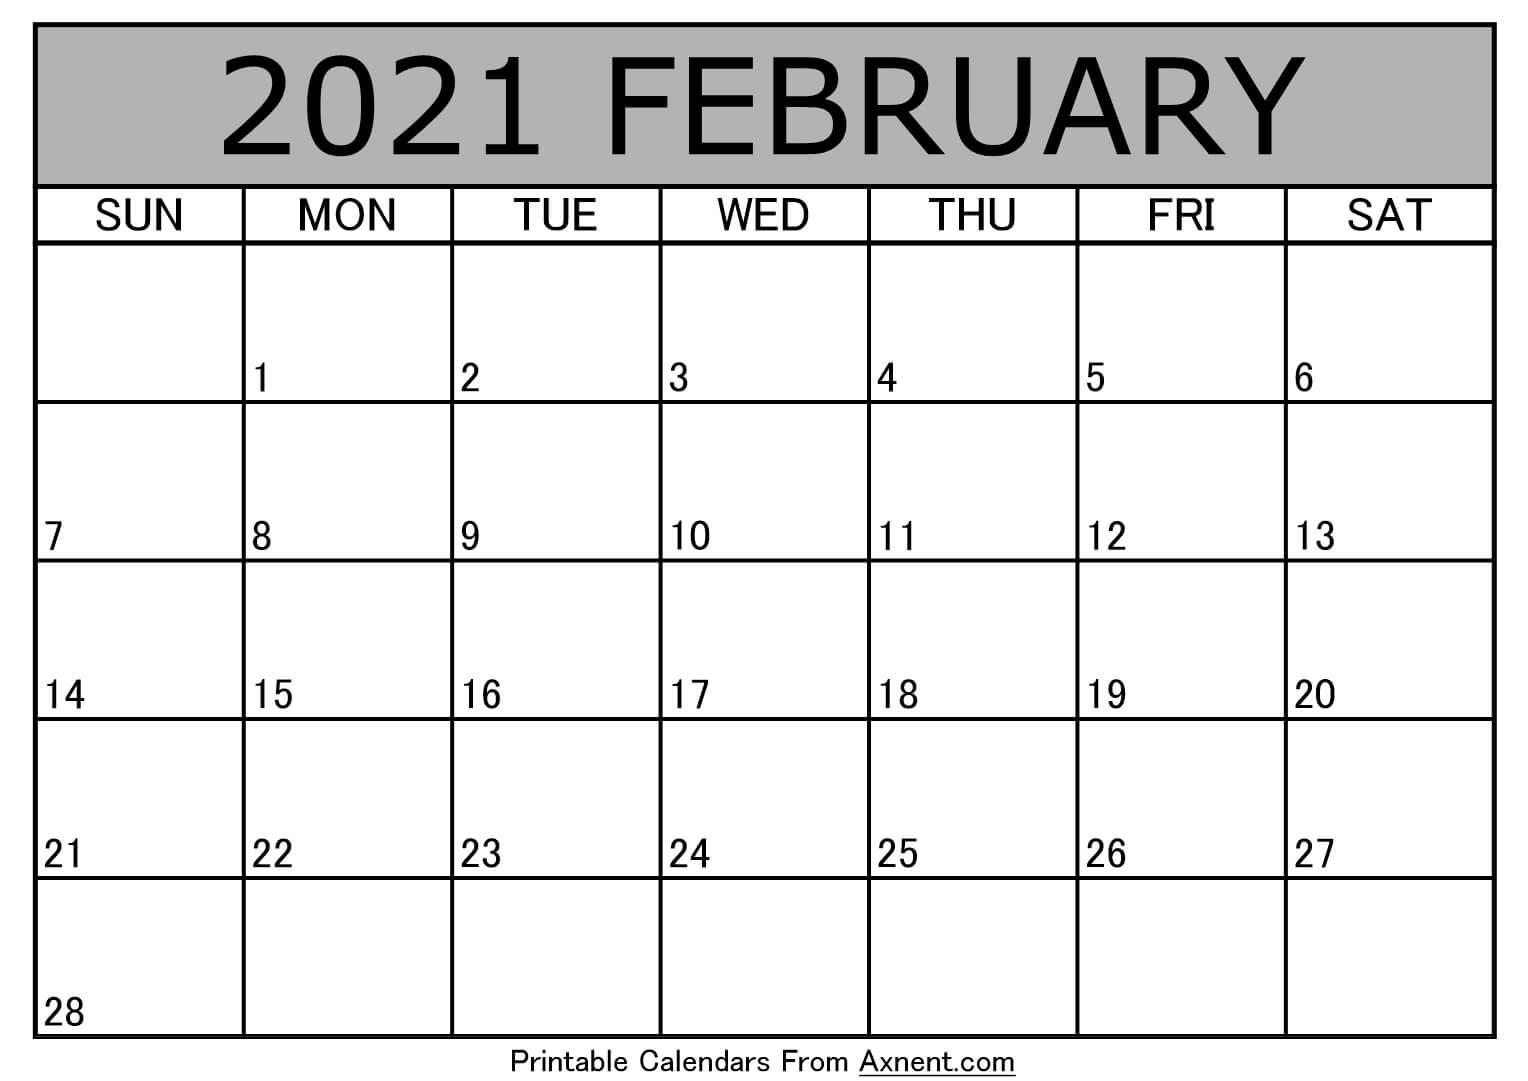 Printable February 2021 Calendar Template - Time